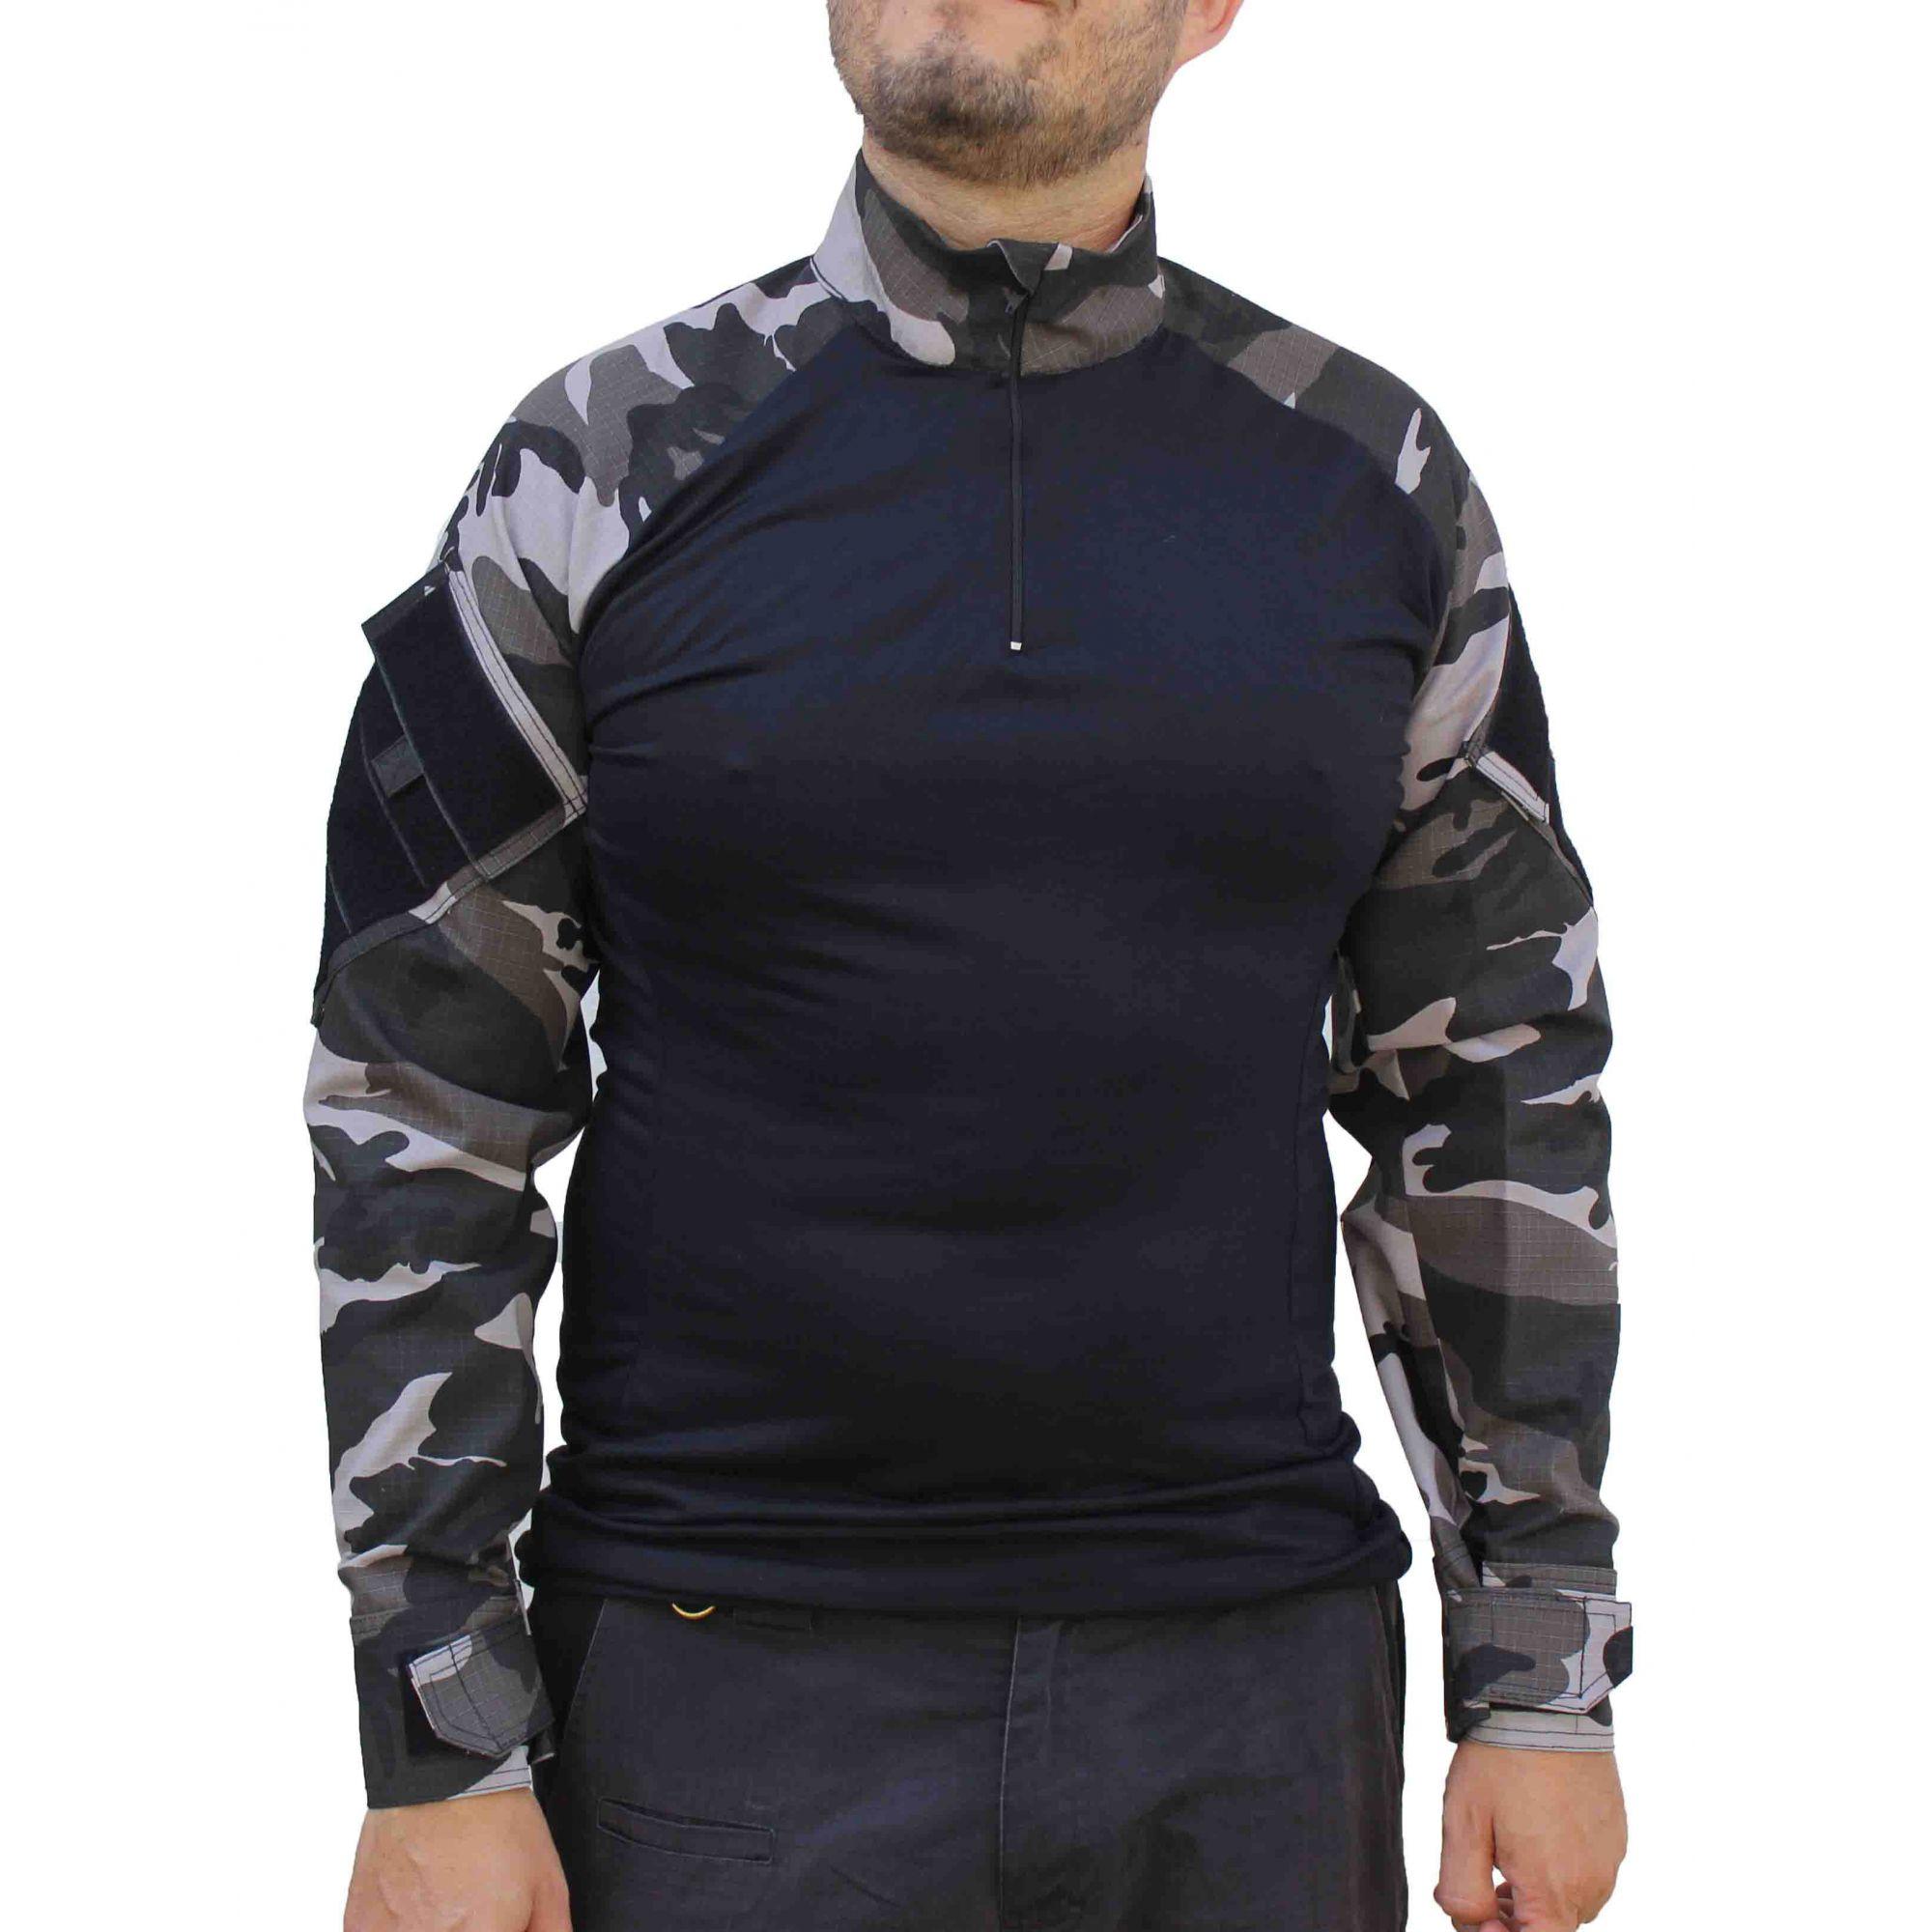 Combat Shirt Tática - Urbano Black